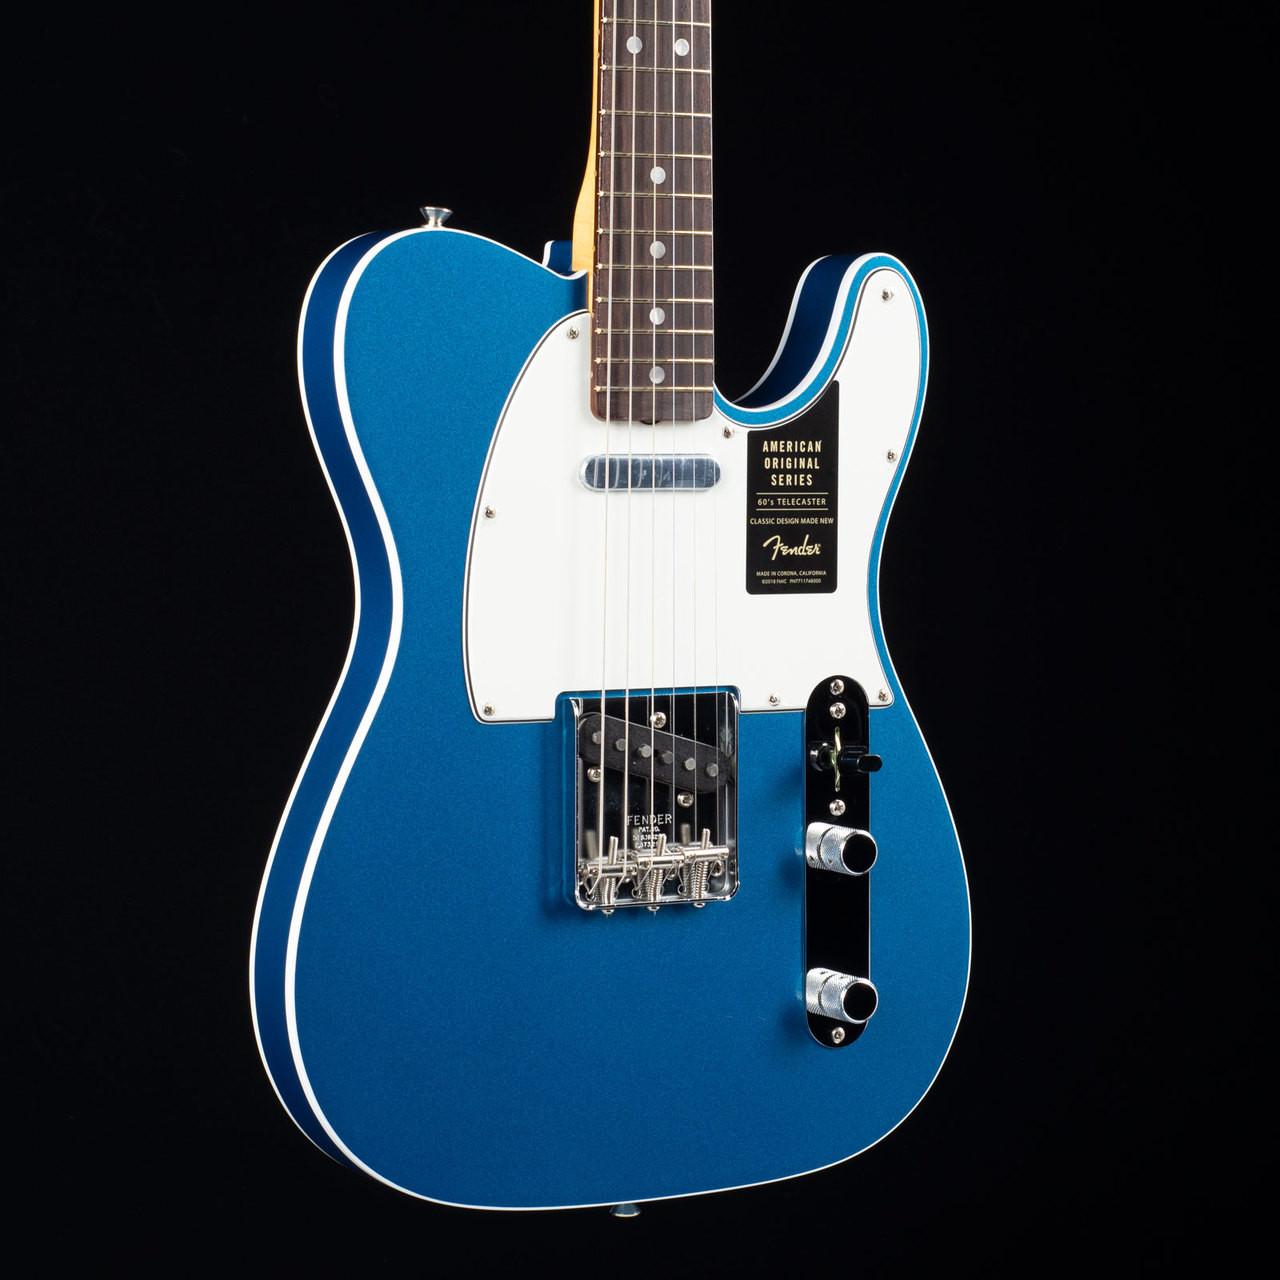 Fender american original 60s telecaster lake placid blue 2251 at fender american original 60s telecaster lake placid blue 2251 publicscrutiny Gallery